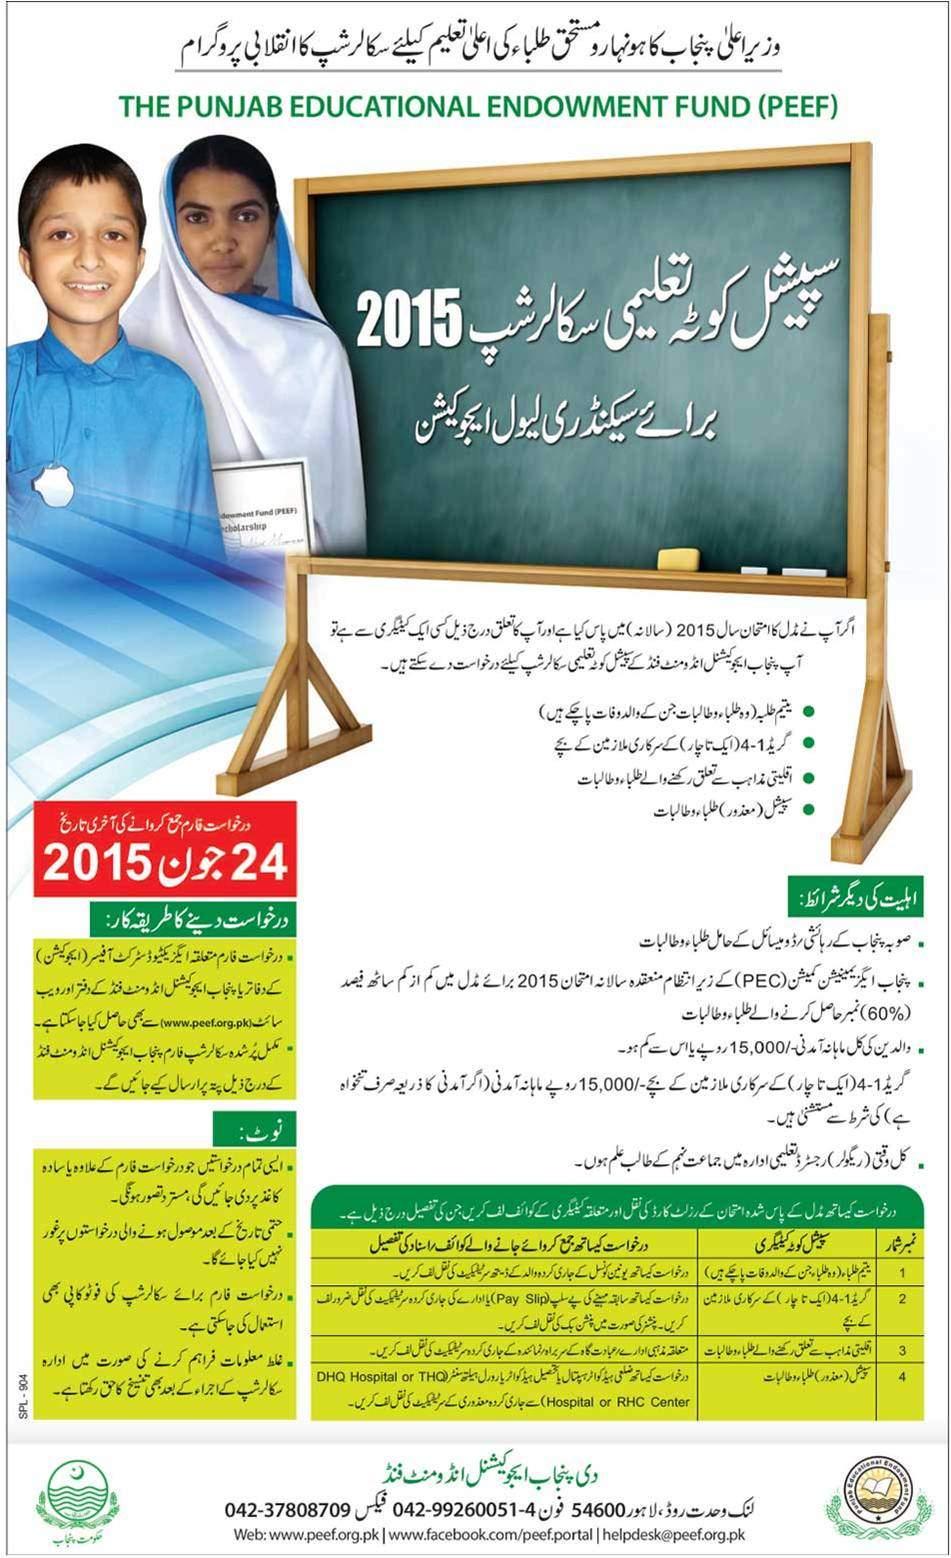 Punjab_Educational_Endowment_Fund_Jun2015a